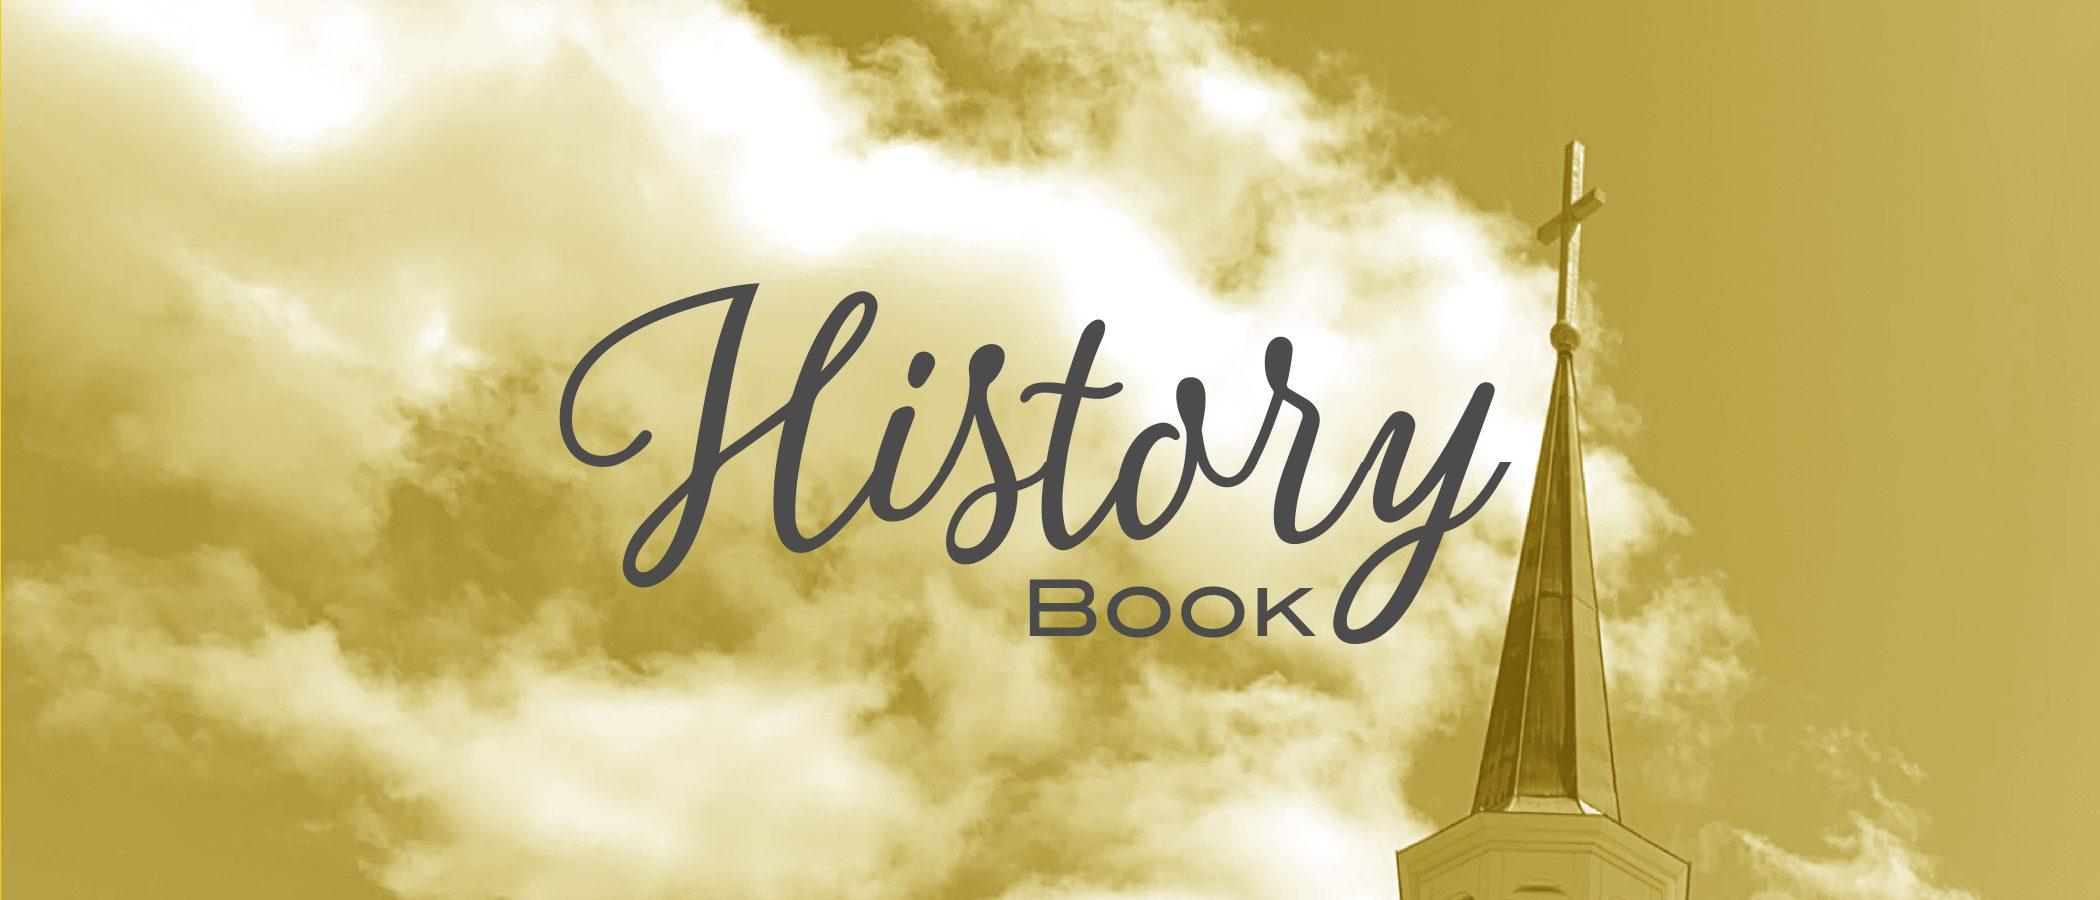 wellspring-history-book-11brd-dq2021-web-banner2x-100